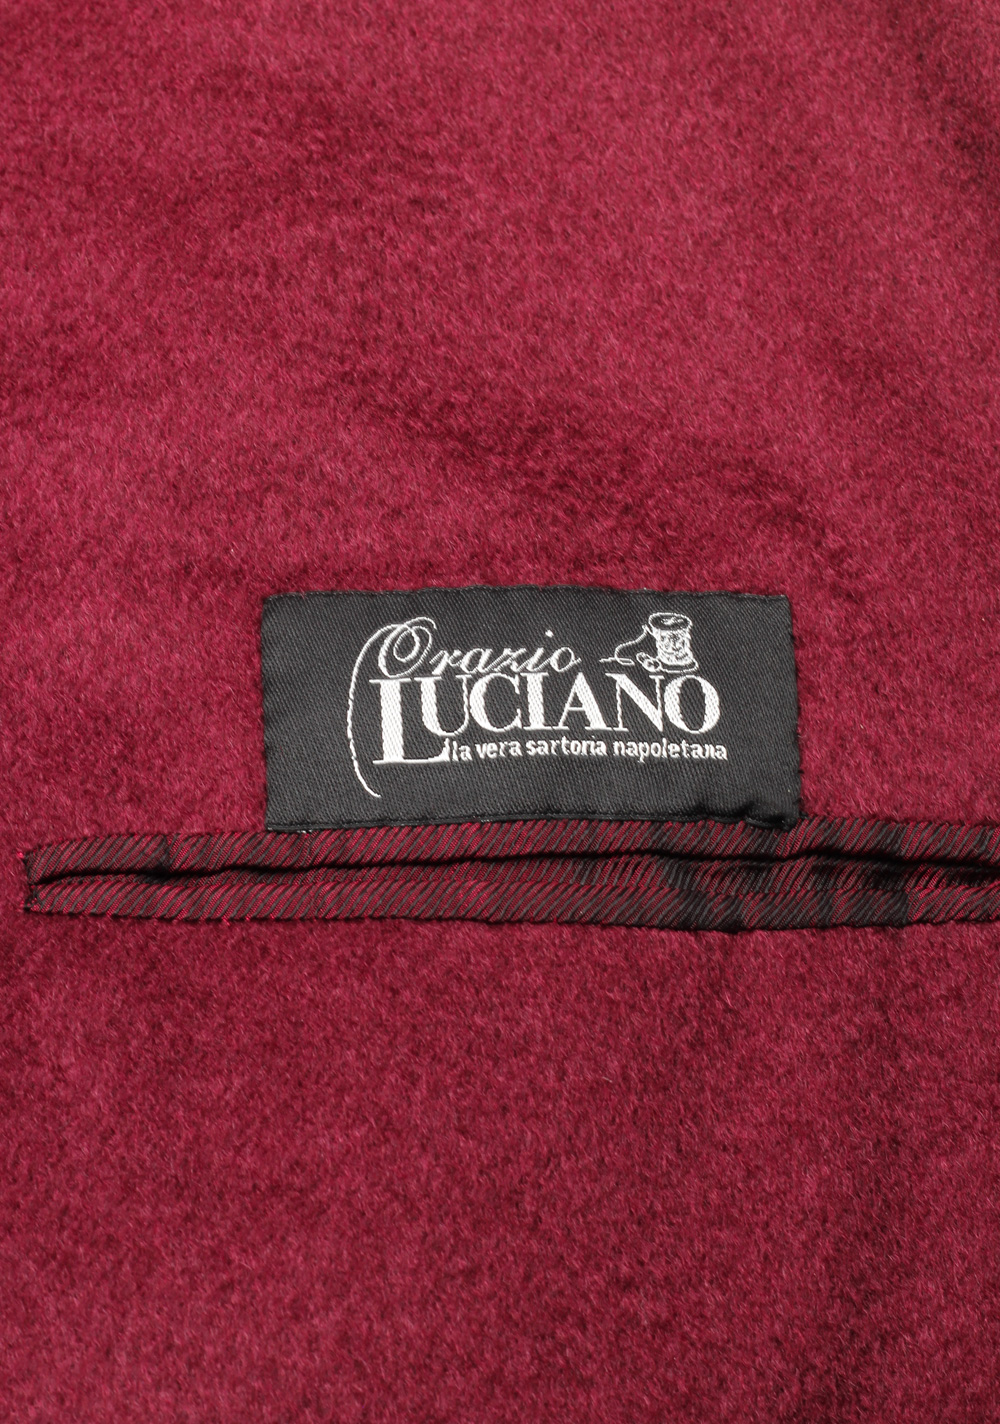 Orazio Luciano Burgundy Double Breasted Over Coat Size 52 / 42R U.S. In Cashmere   Costume Limité